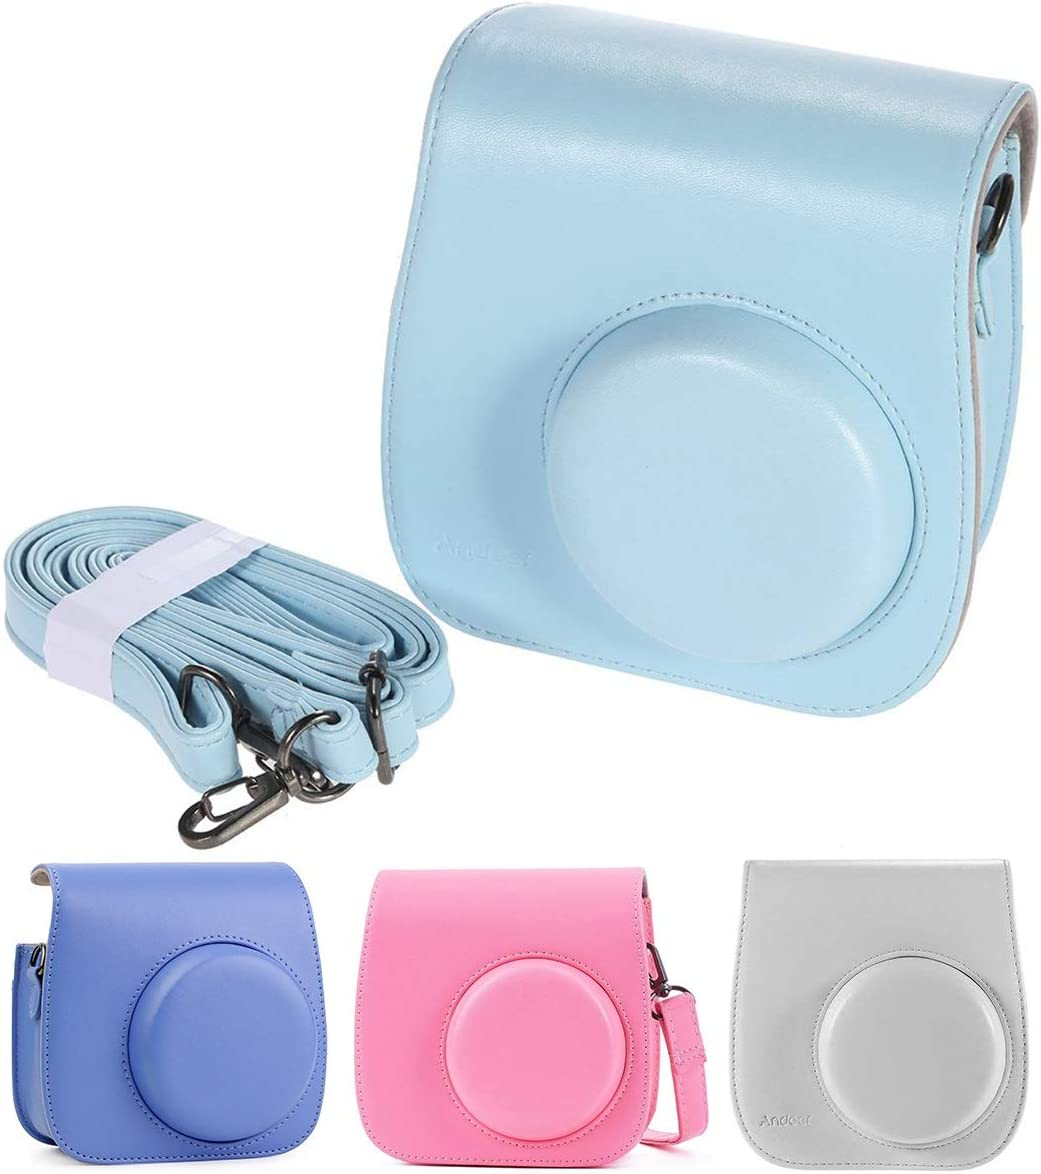 Topsale-ycld Camera Cover Shoulder Bag Case for Fujifilm Instax Mini 8//8+ 9 Instant Polaroid Camera Color : Dark Blue